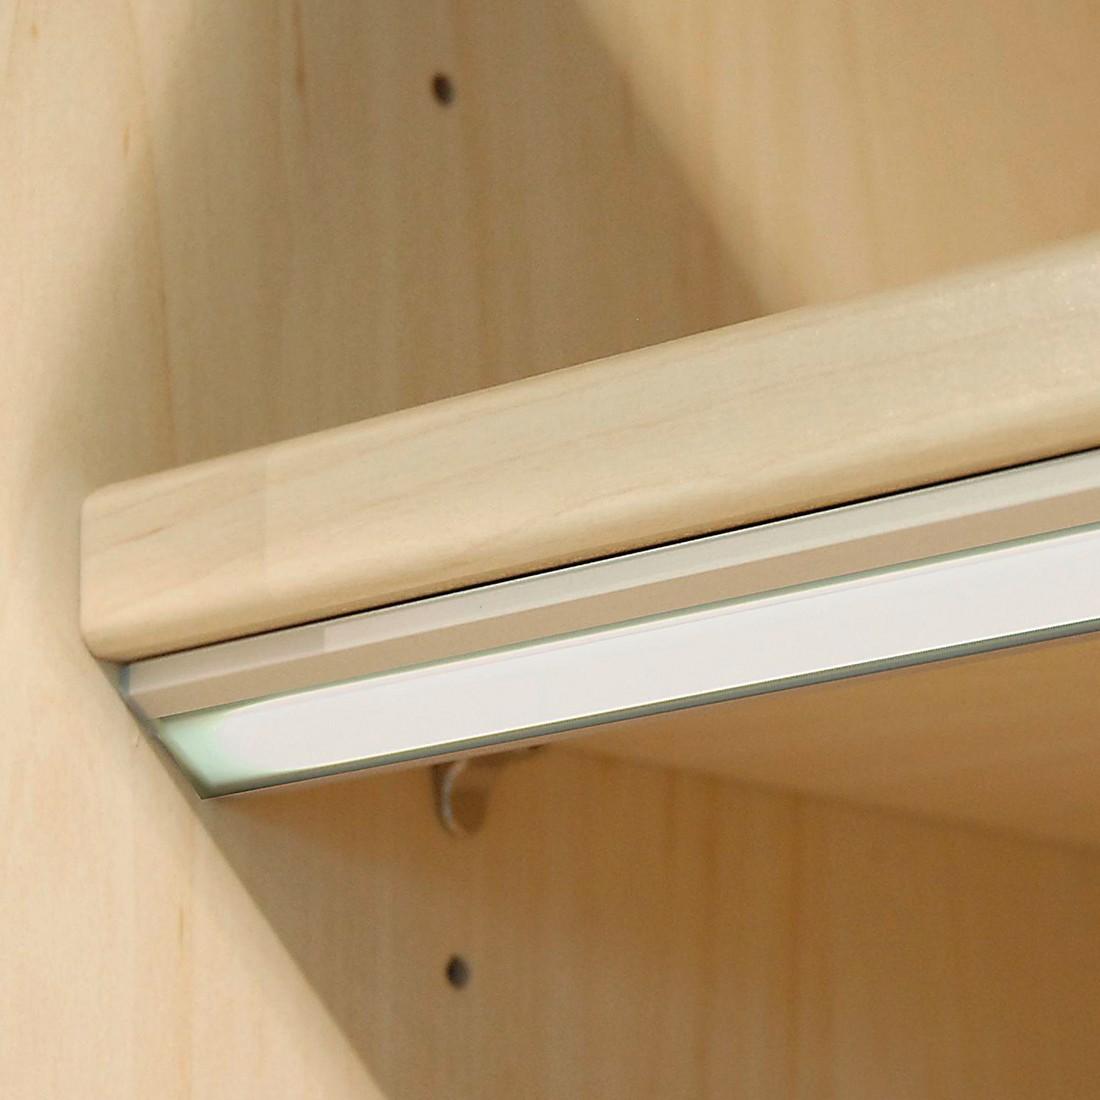 EEK A+, LED – Innenbeleuchtung für Schwebetürenschränke – Rauch Dialog, Rauch Dialog online bestellen